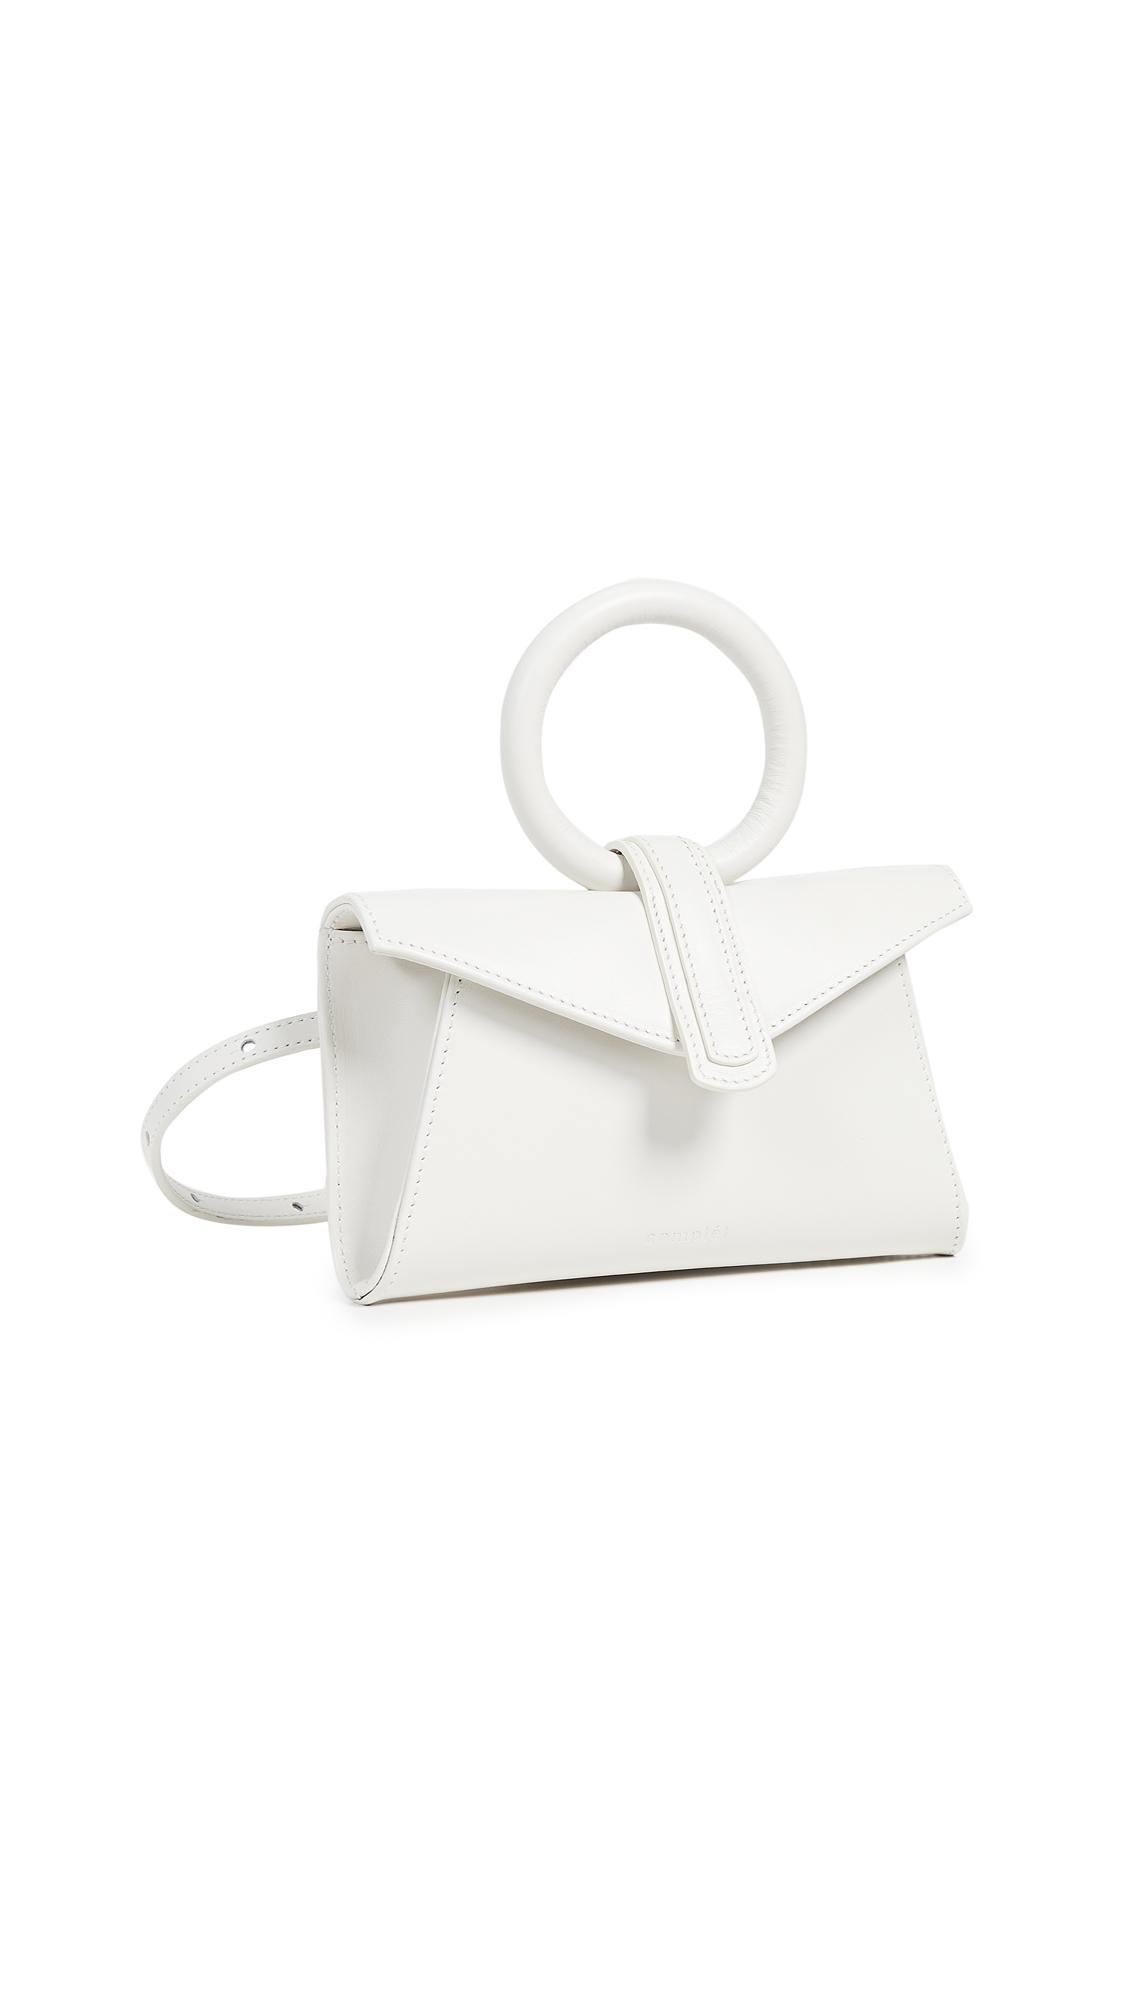 COMPLET Valery Micro Belt Bag in Ecru